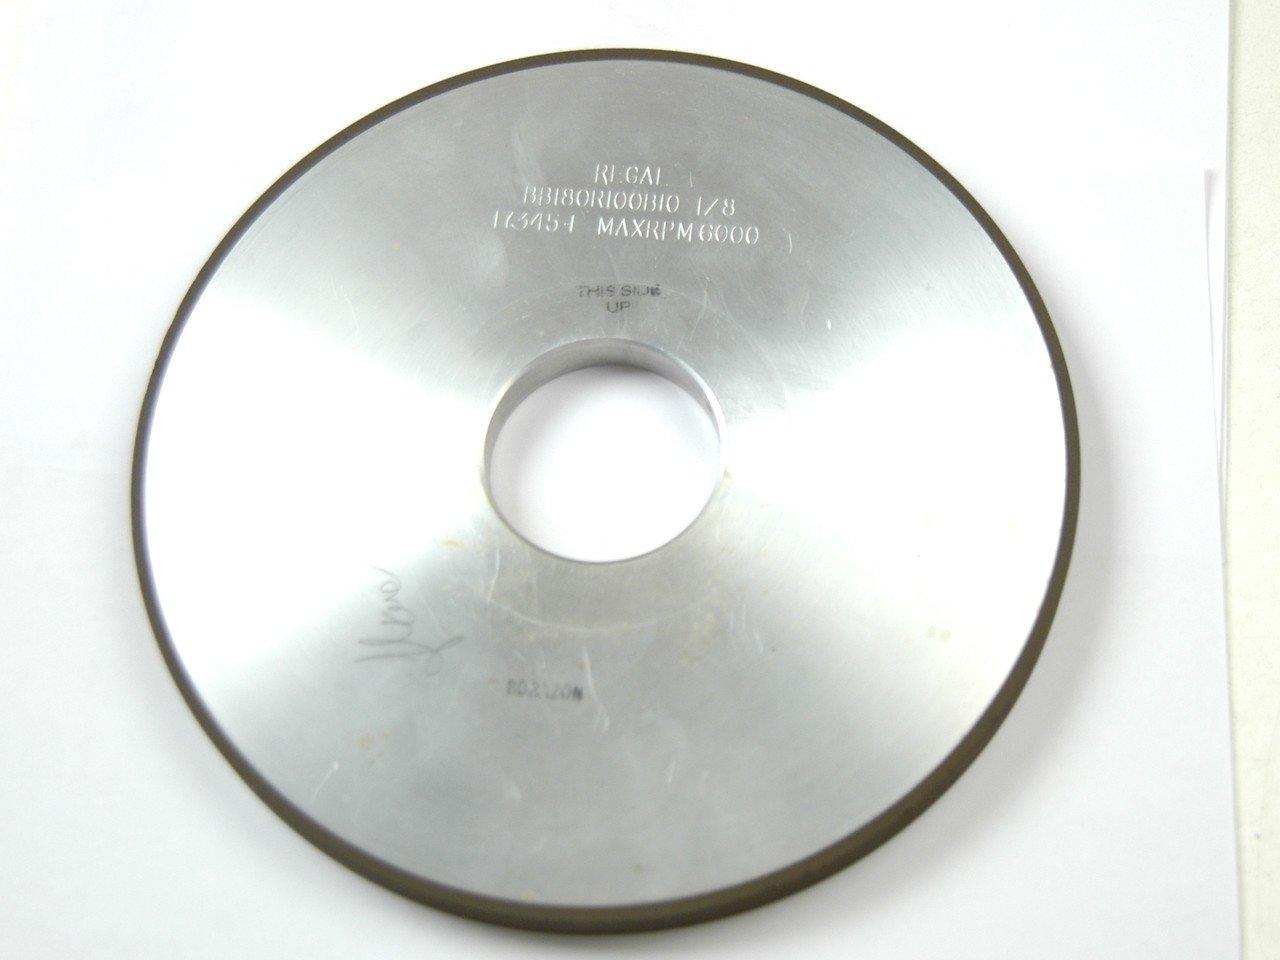 8 X 1/2 X 2 CBN GRINDING WHEEL-1A1- BB180R100B10-1/8. NEW OR LIKE NEW by REGAL DIAMOND